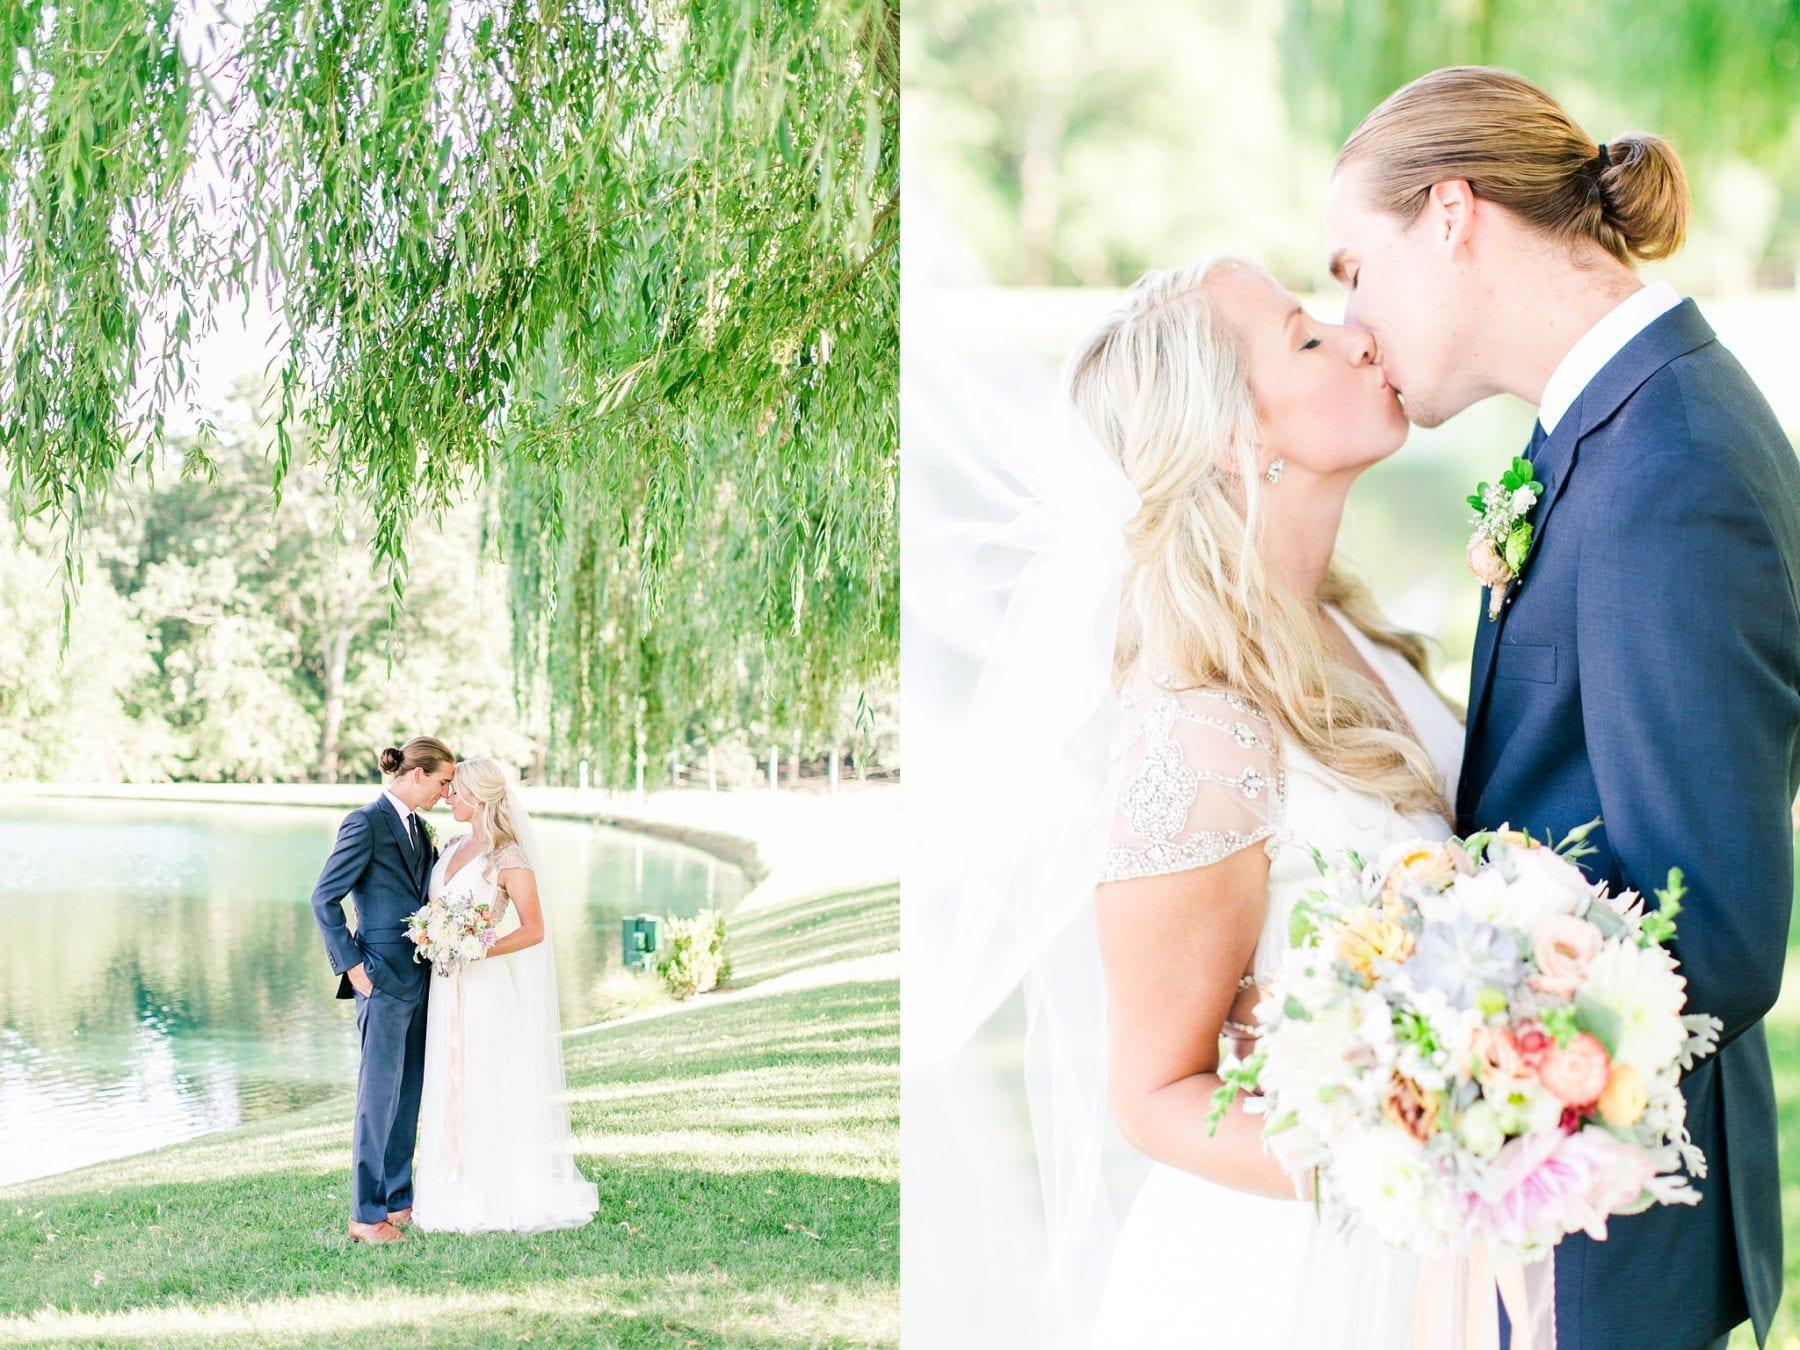 Pond View Farm Wedding Photos Maryland Wedding Photographer Kristen & Ryan Megan Kelsey Photography Blog-174.jpg